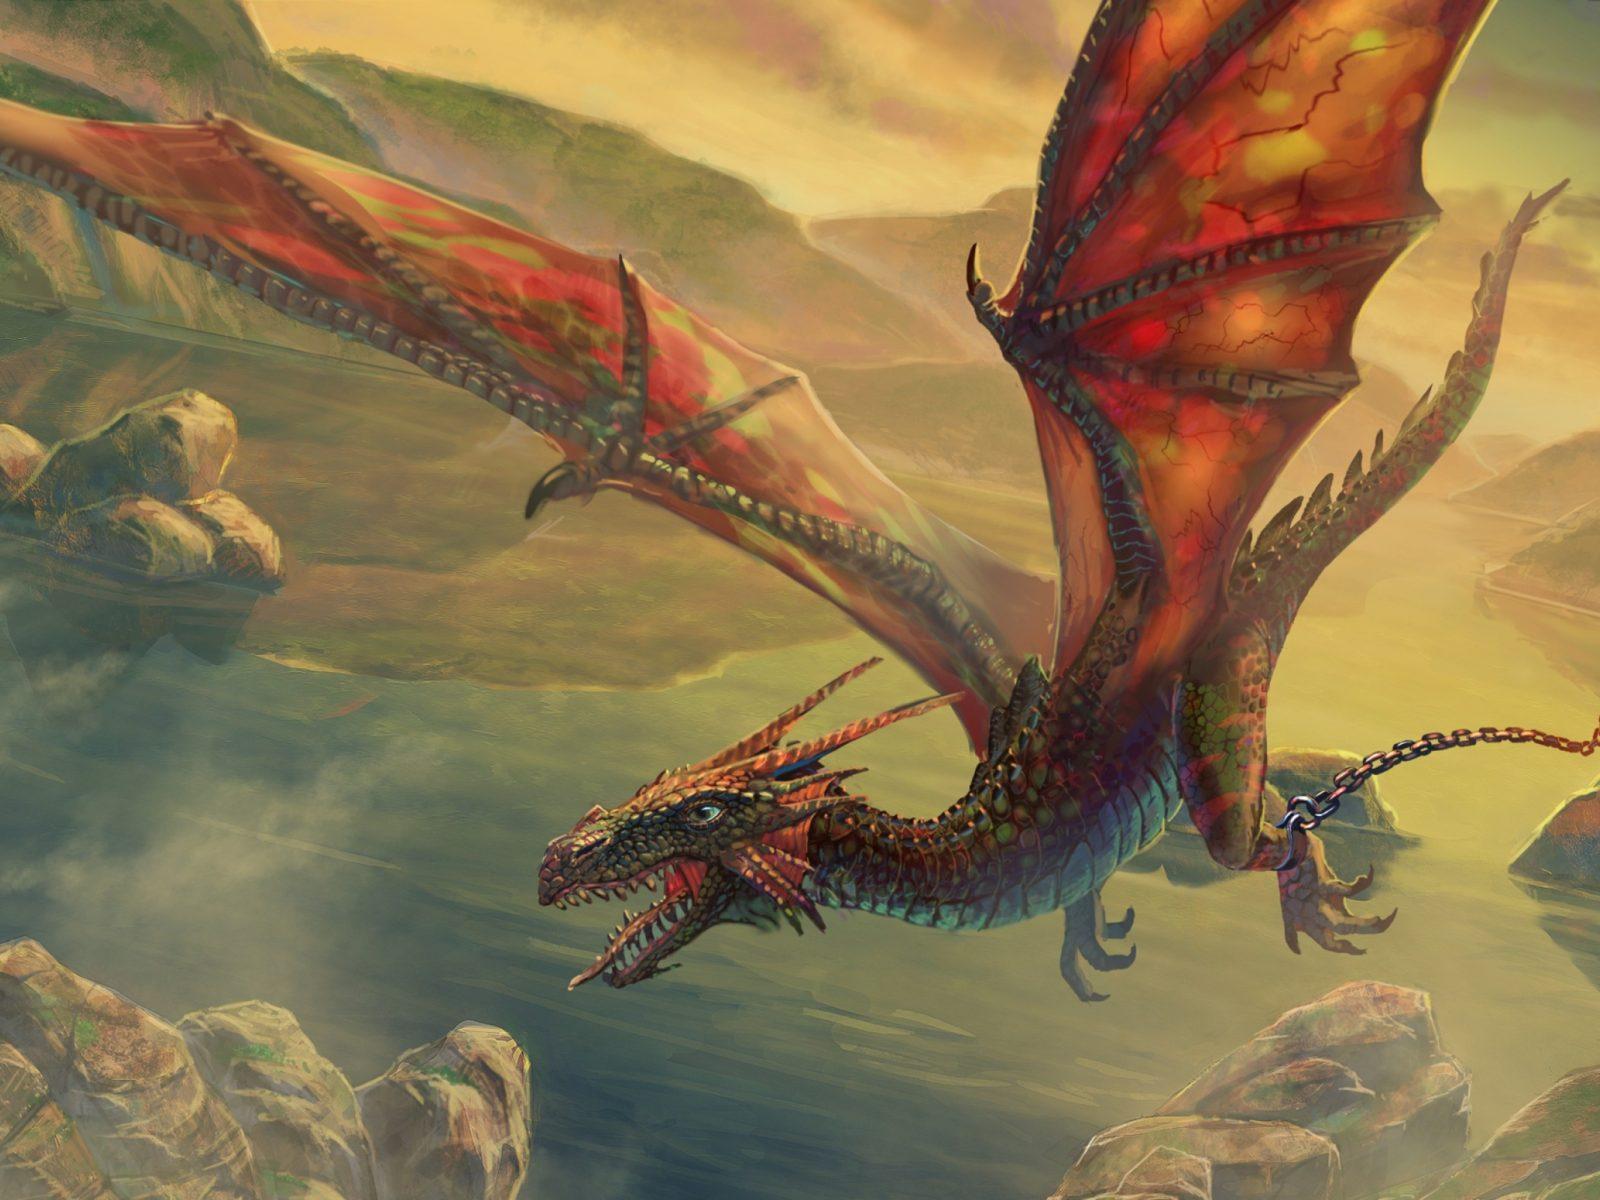 Get It Girl Wallpaper Wings Dragons Flying Fantasy Art Escape Artwork Air